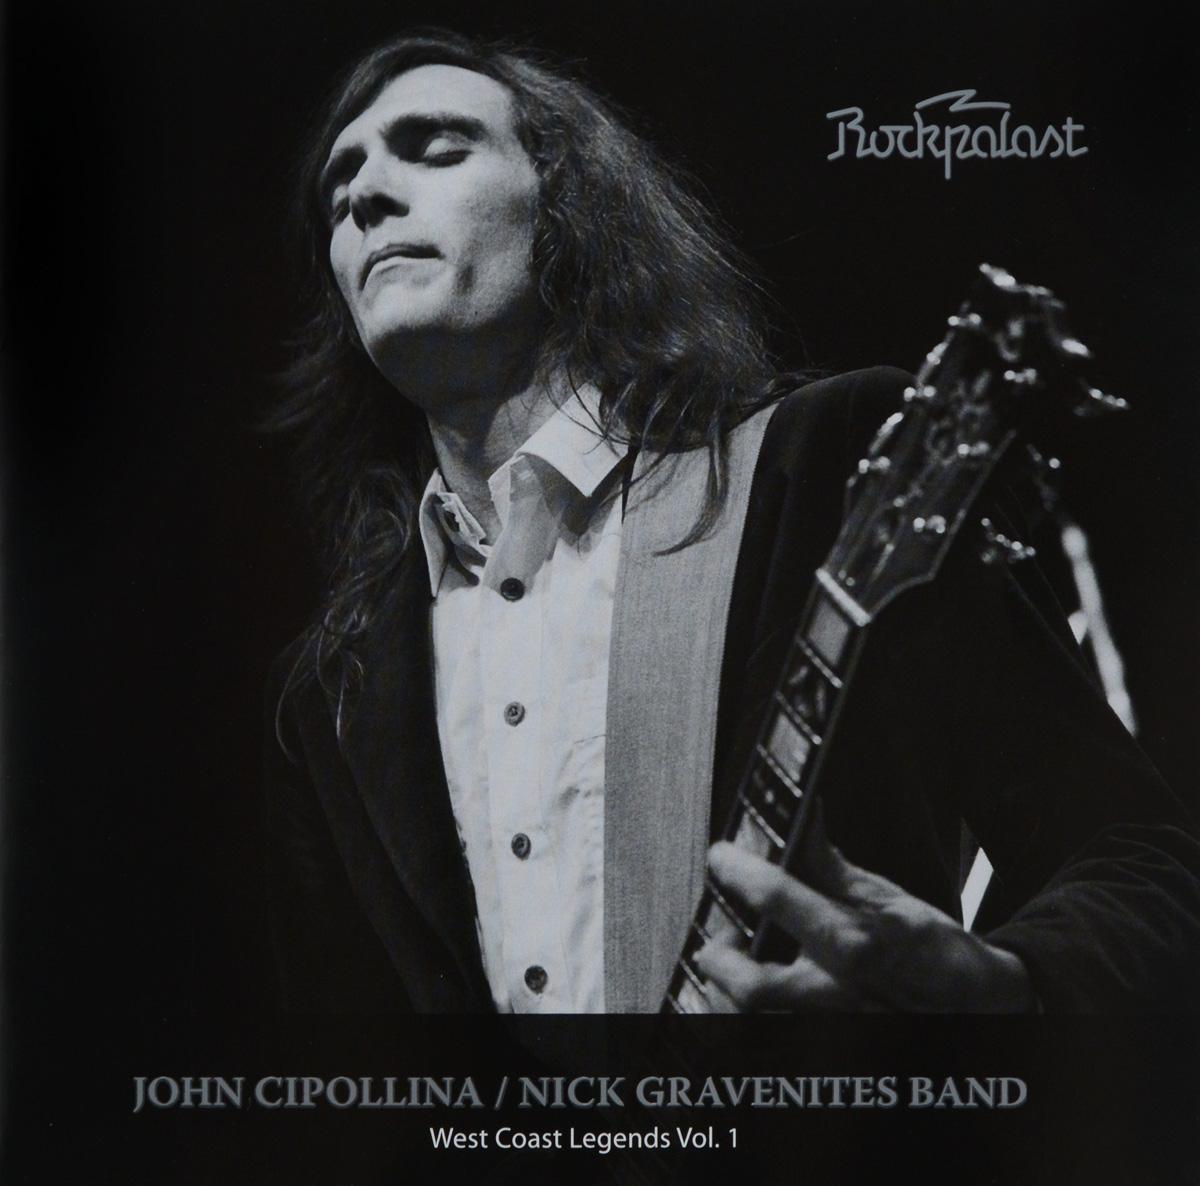 Джон Чиполлина,Nick Gravenites Band Rockpalast. John Cipollina. Nick Gravenites Band. West Coast Legends. Vol. 1 nick mason berlin